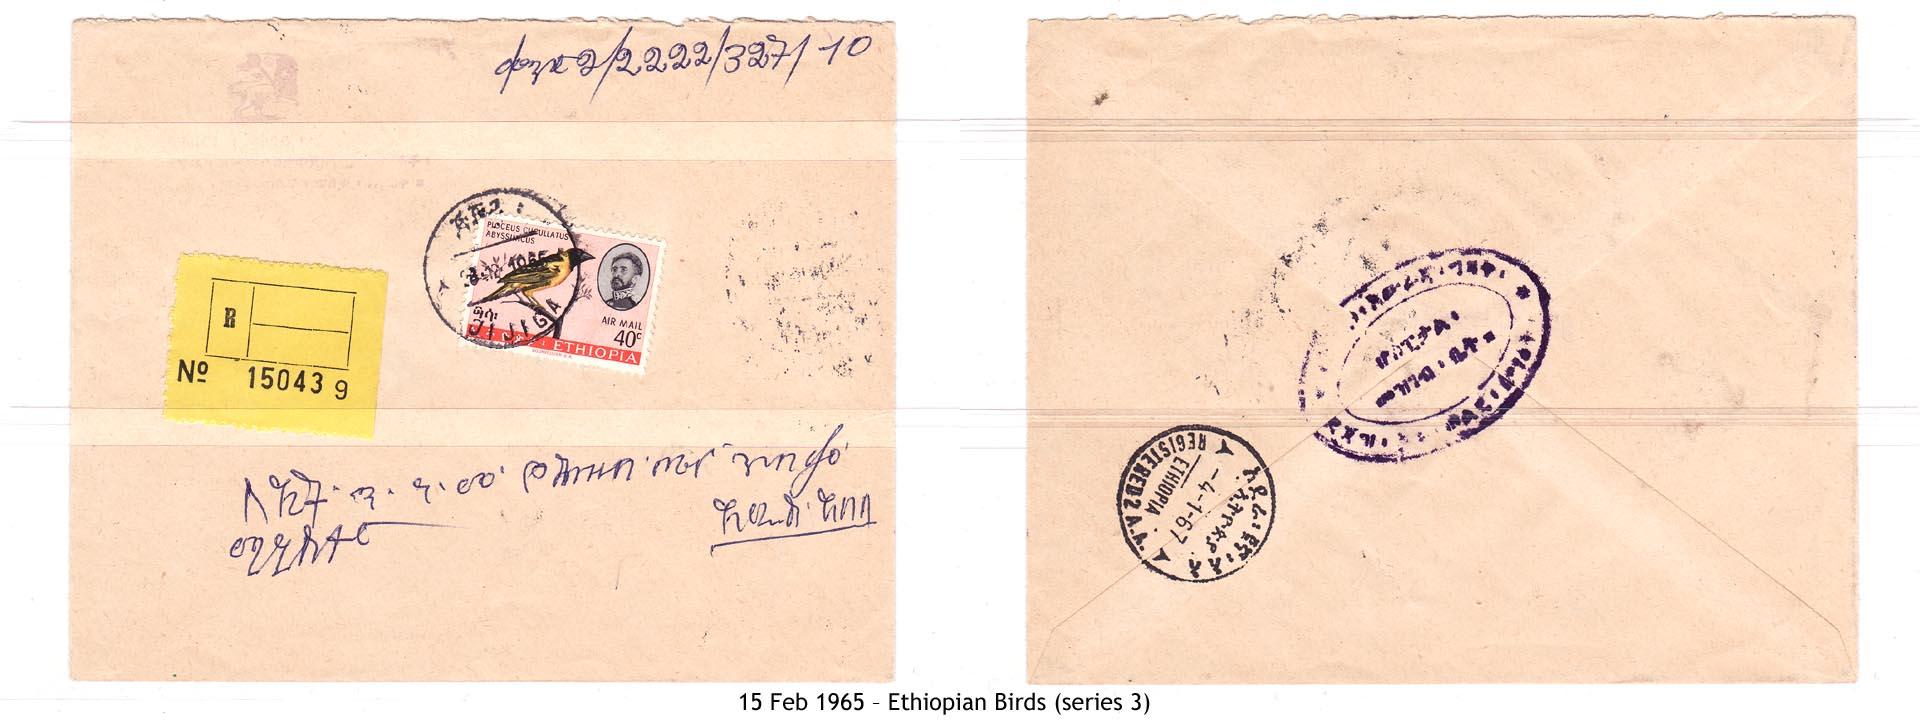 19660215 – Ethiopian Birds (series 3)